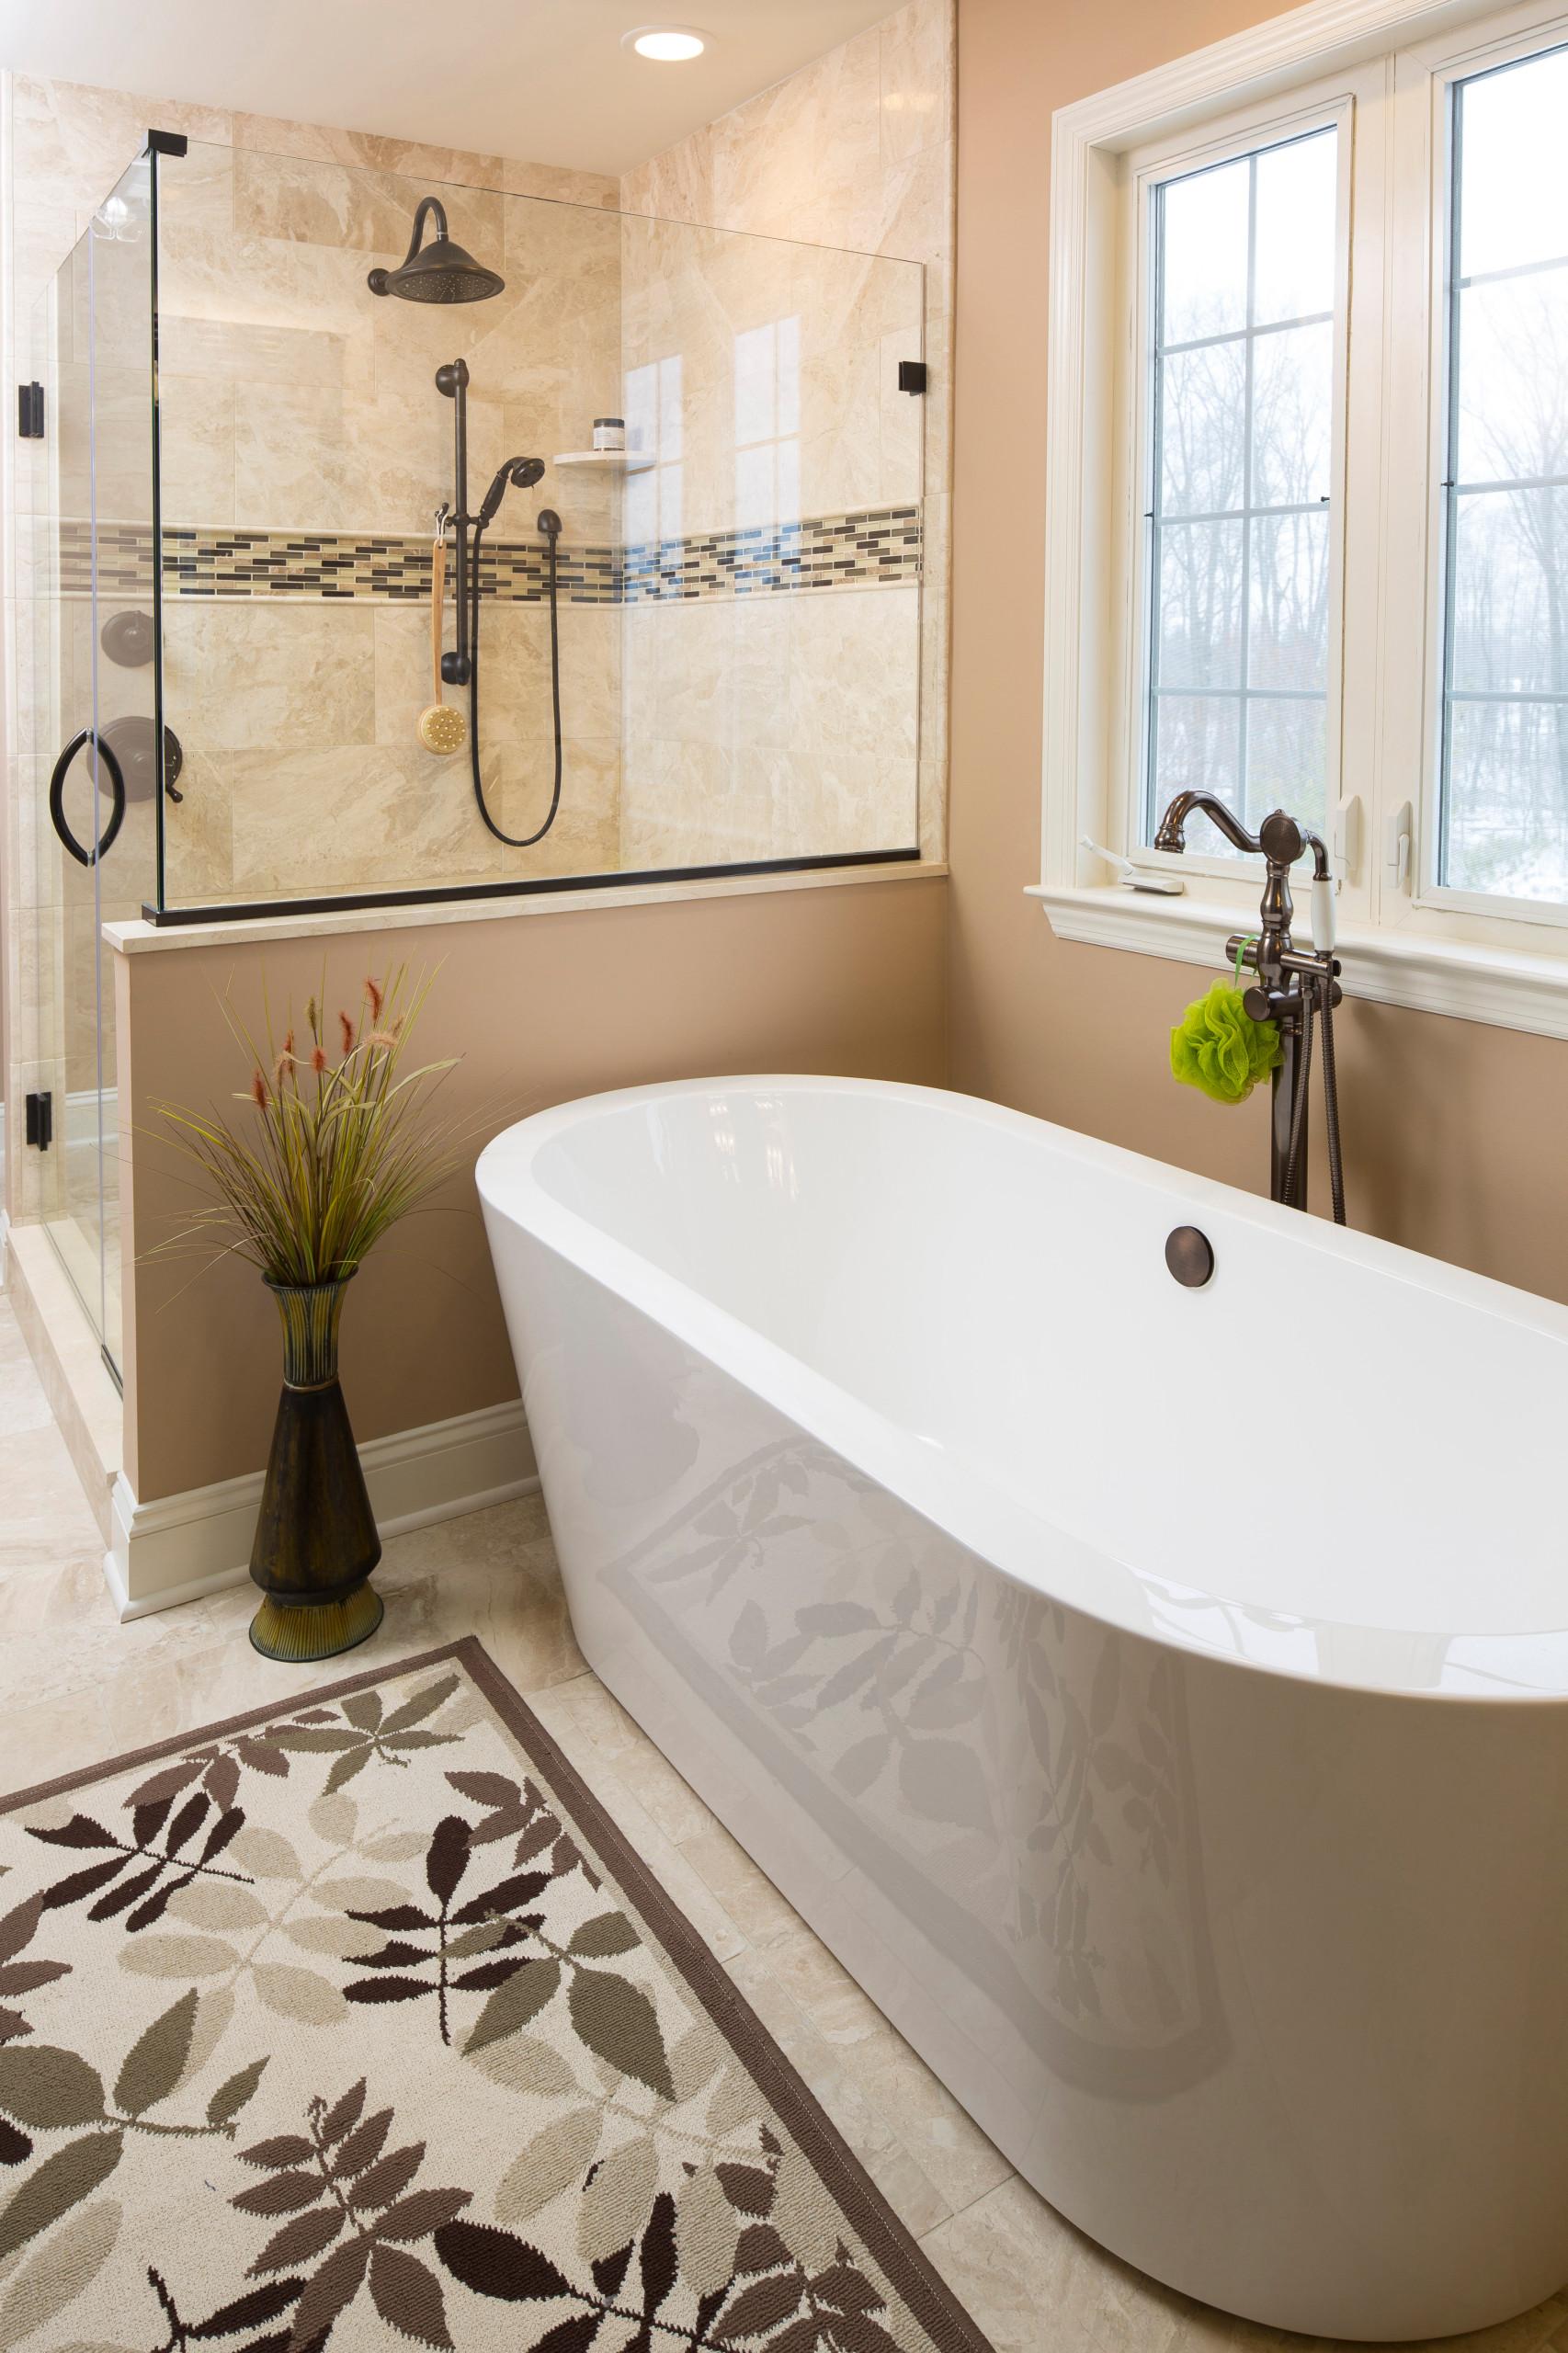 C. D.'s Master Bath